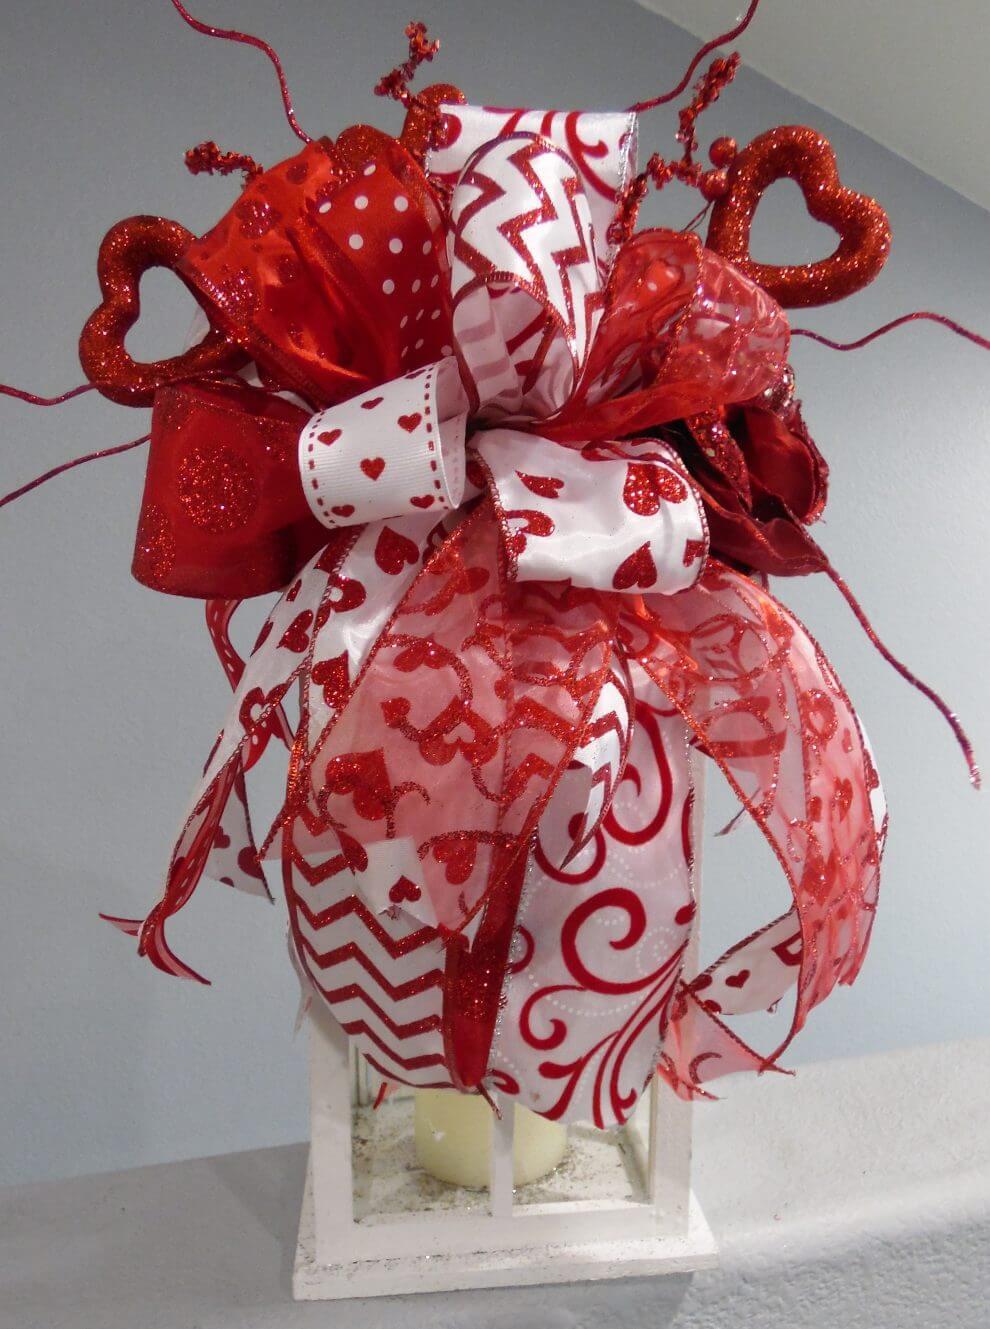 Marvelous Valentines Day Swag Lantern Swag Heart Swag Centerpiece Interior Design Ideas Helimdqseriescom